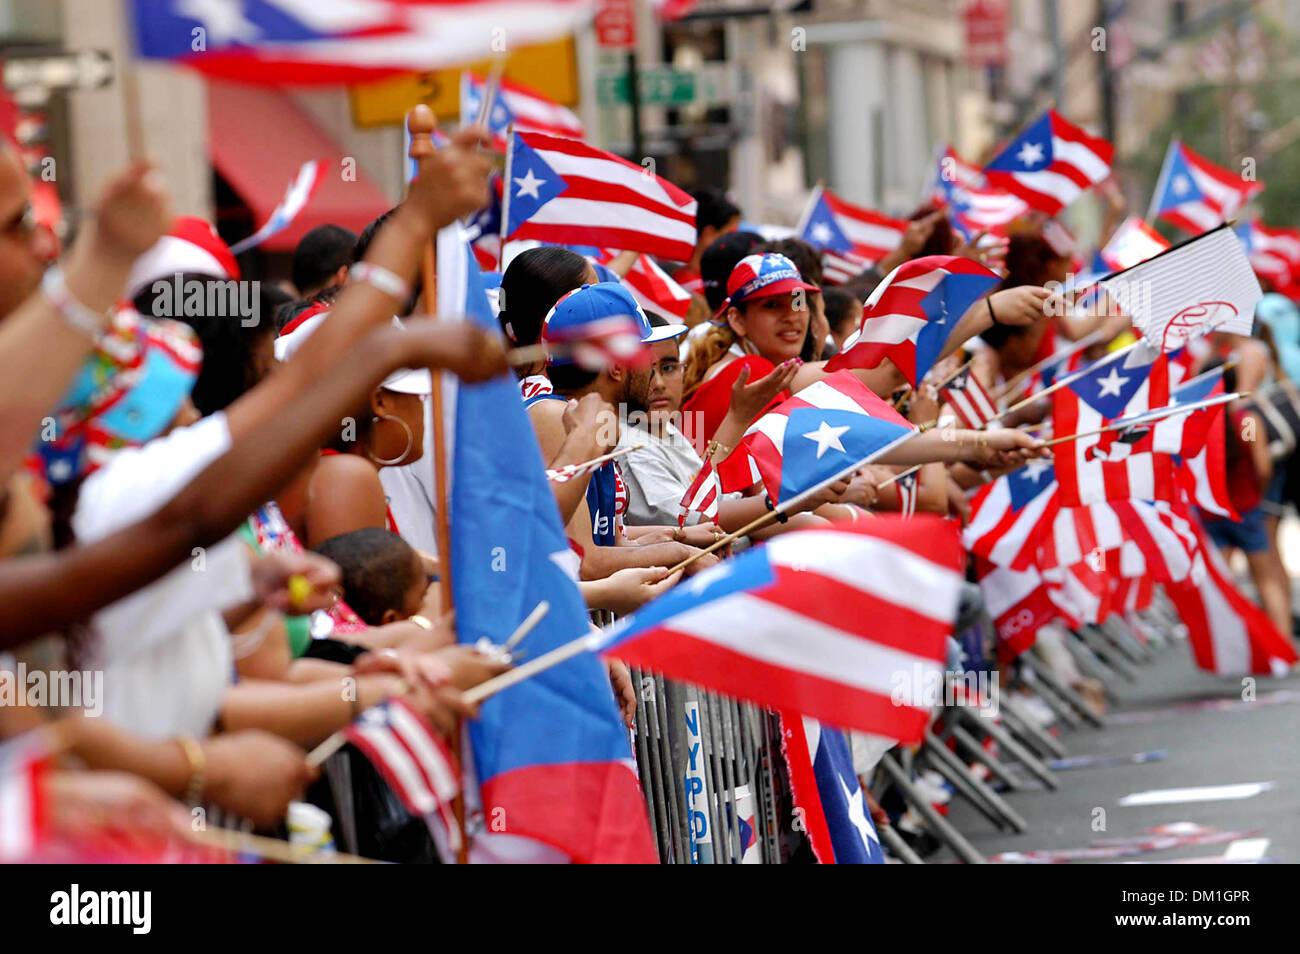 Apr. 28, 2002 - K43659AR.48TH ANNUAL PUERTO RICAN DAY PARADE 5T AVE, NEW YORK CITY  06-12-2005. ANDREA RENAULT-   PARADE FANS(Credit Image: © Globe Photos/ZUMAPRESS.com) - Stock Image